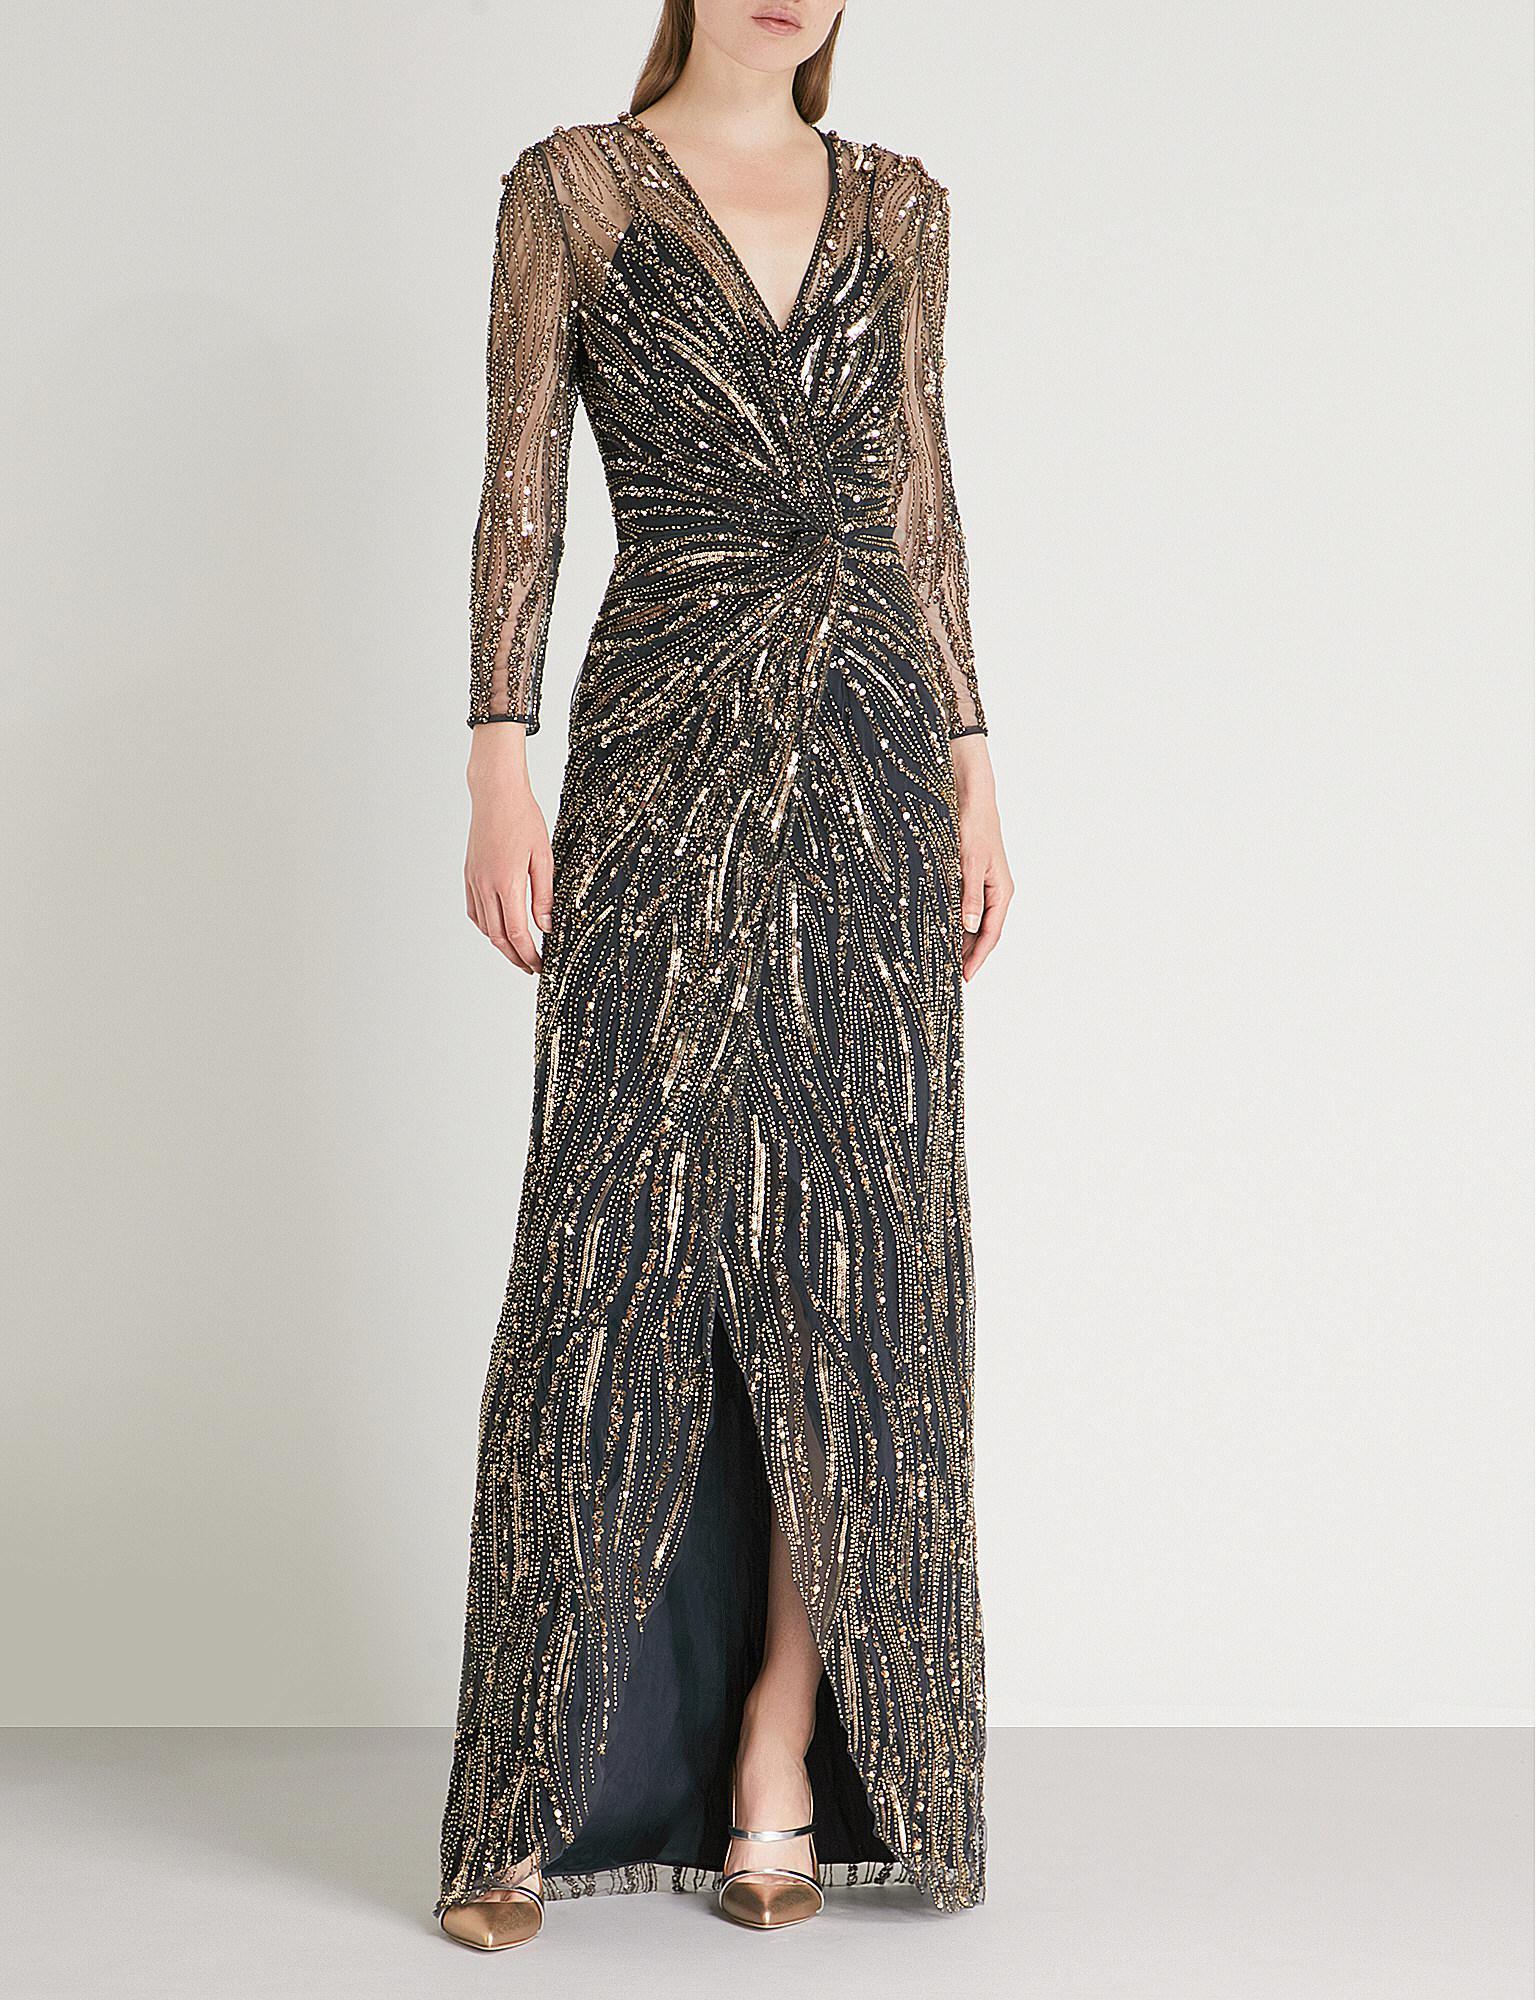 Jenny Packham Phoenix Sequin-embellished Mesh Gown - Lyst